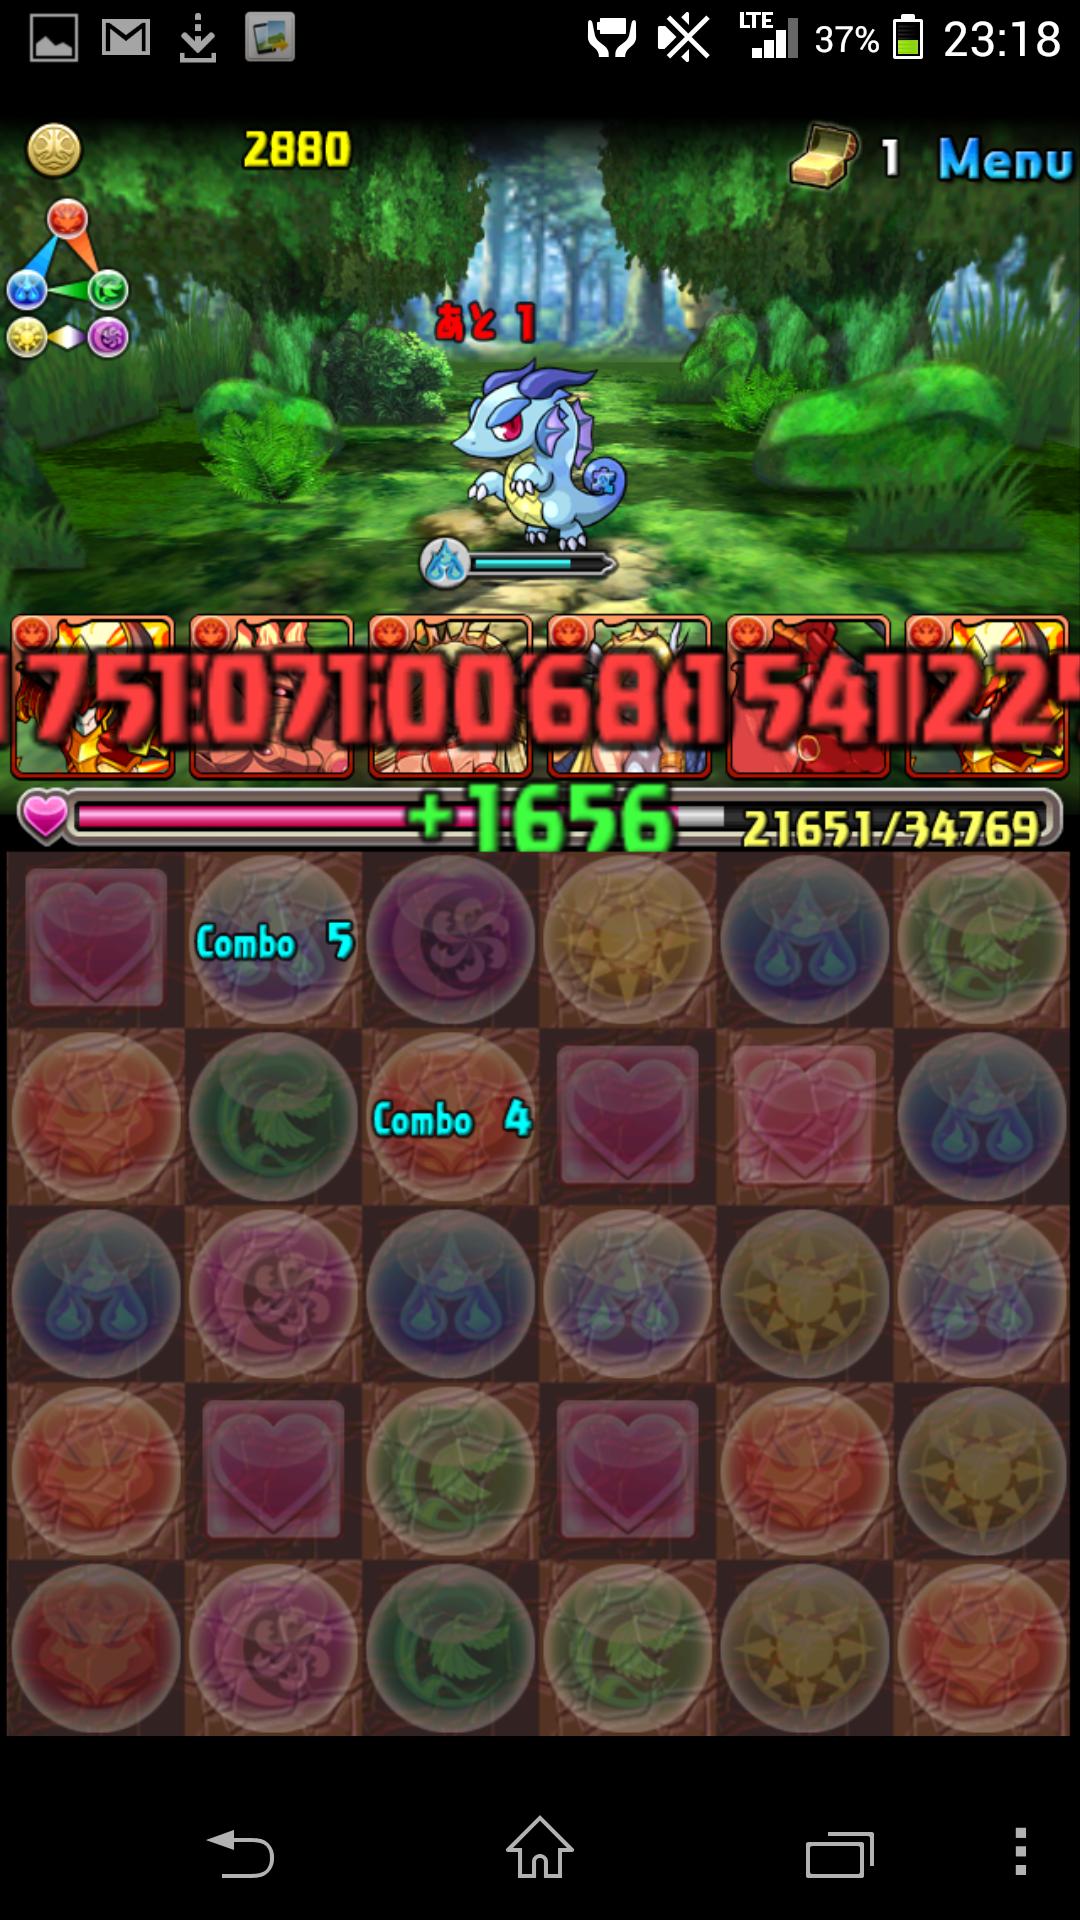 Screenshot_2014-04-15-23-18-54.png